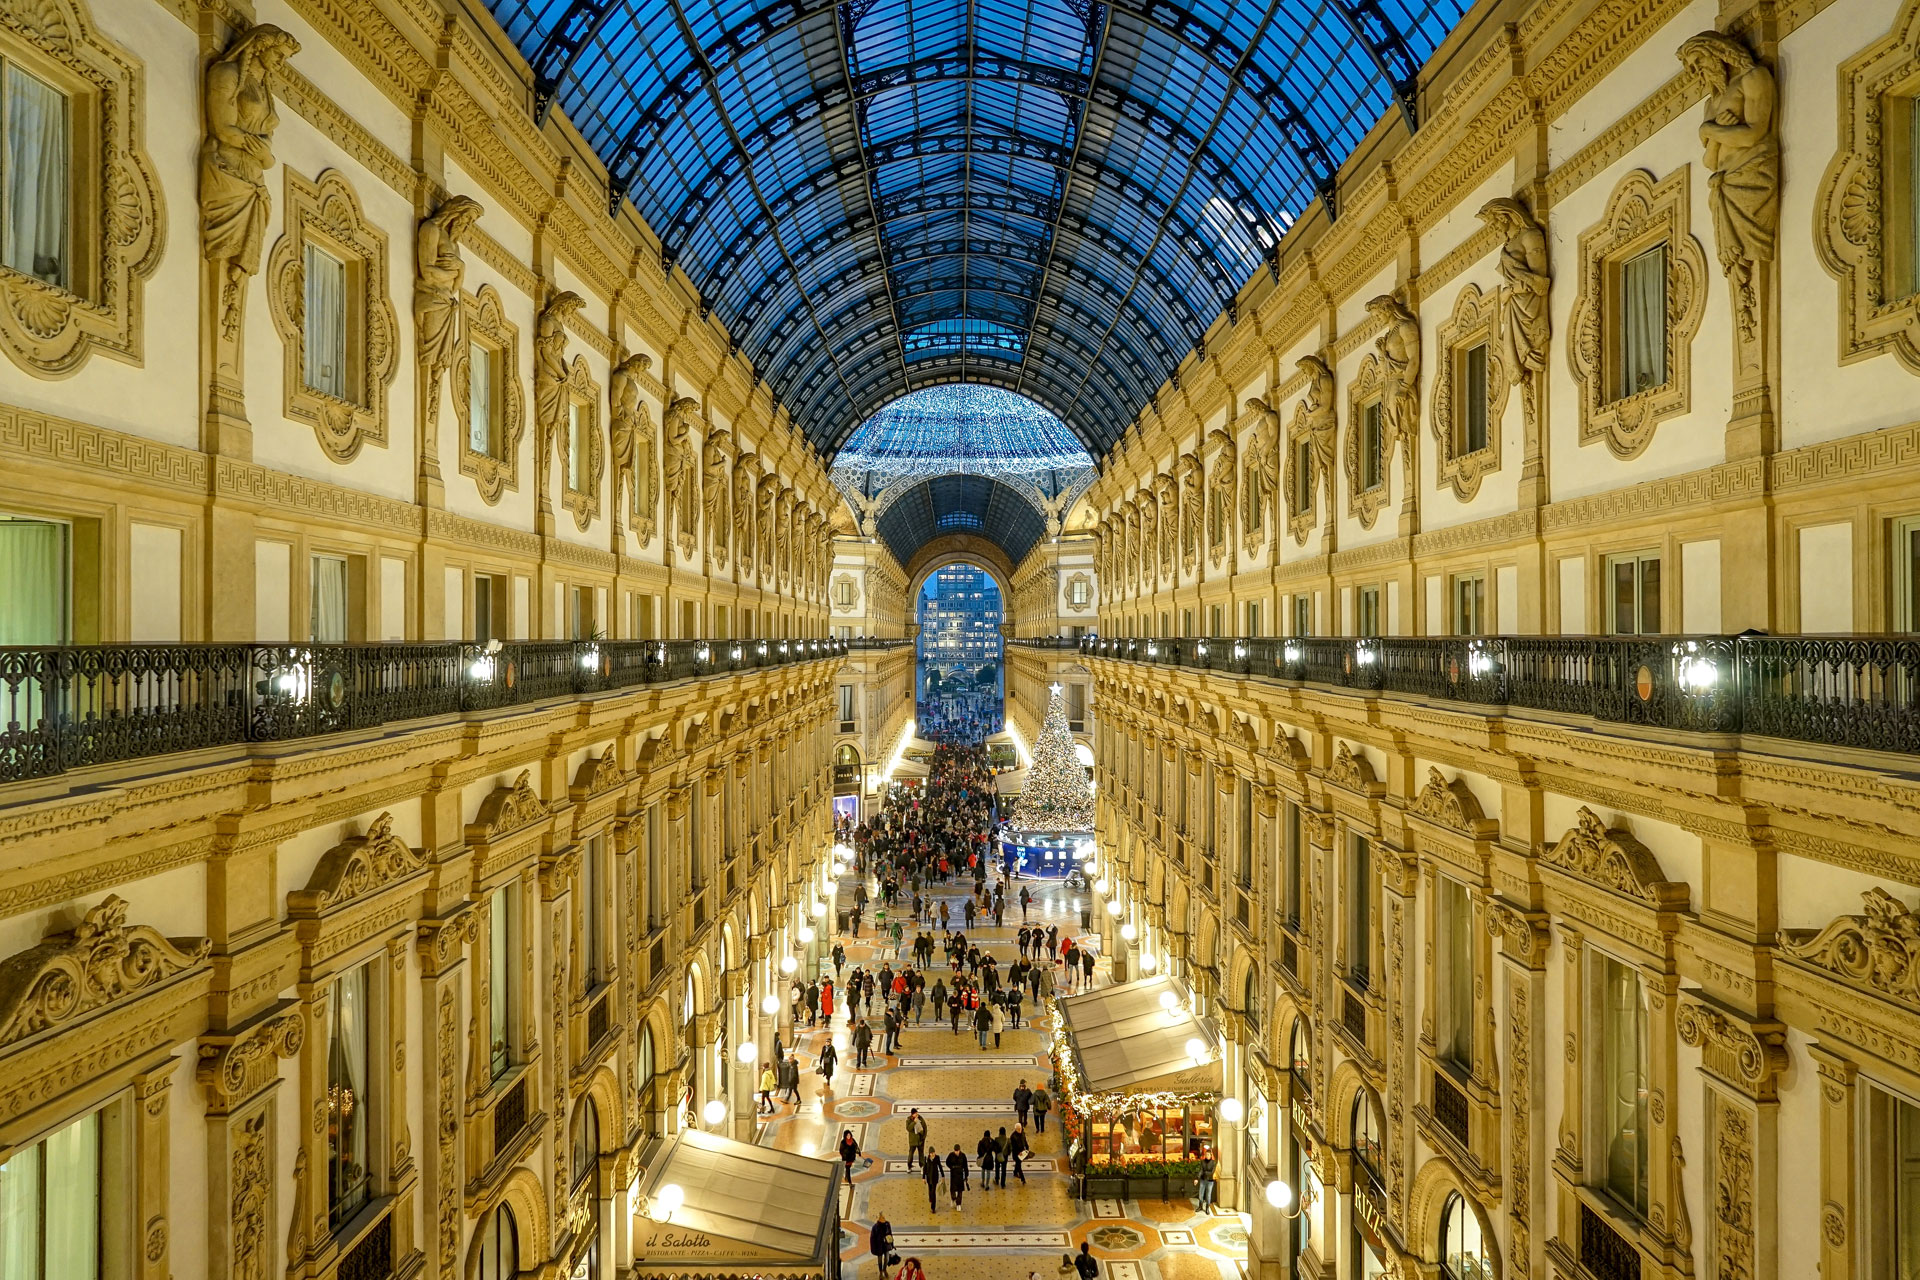 galleria vittorio emanuele, natale galleria vittorio emanuele, architettura milanese, milano, elena galimberti, fotografia